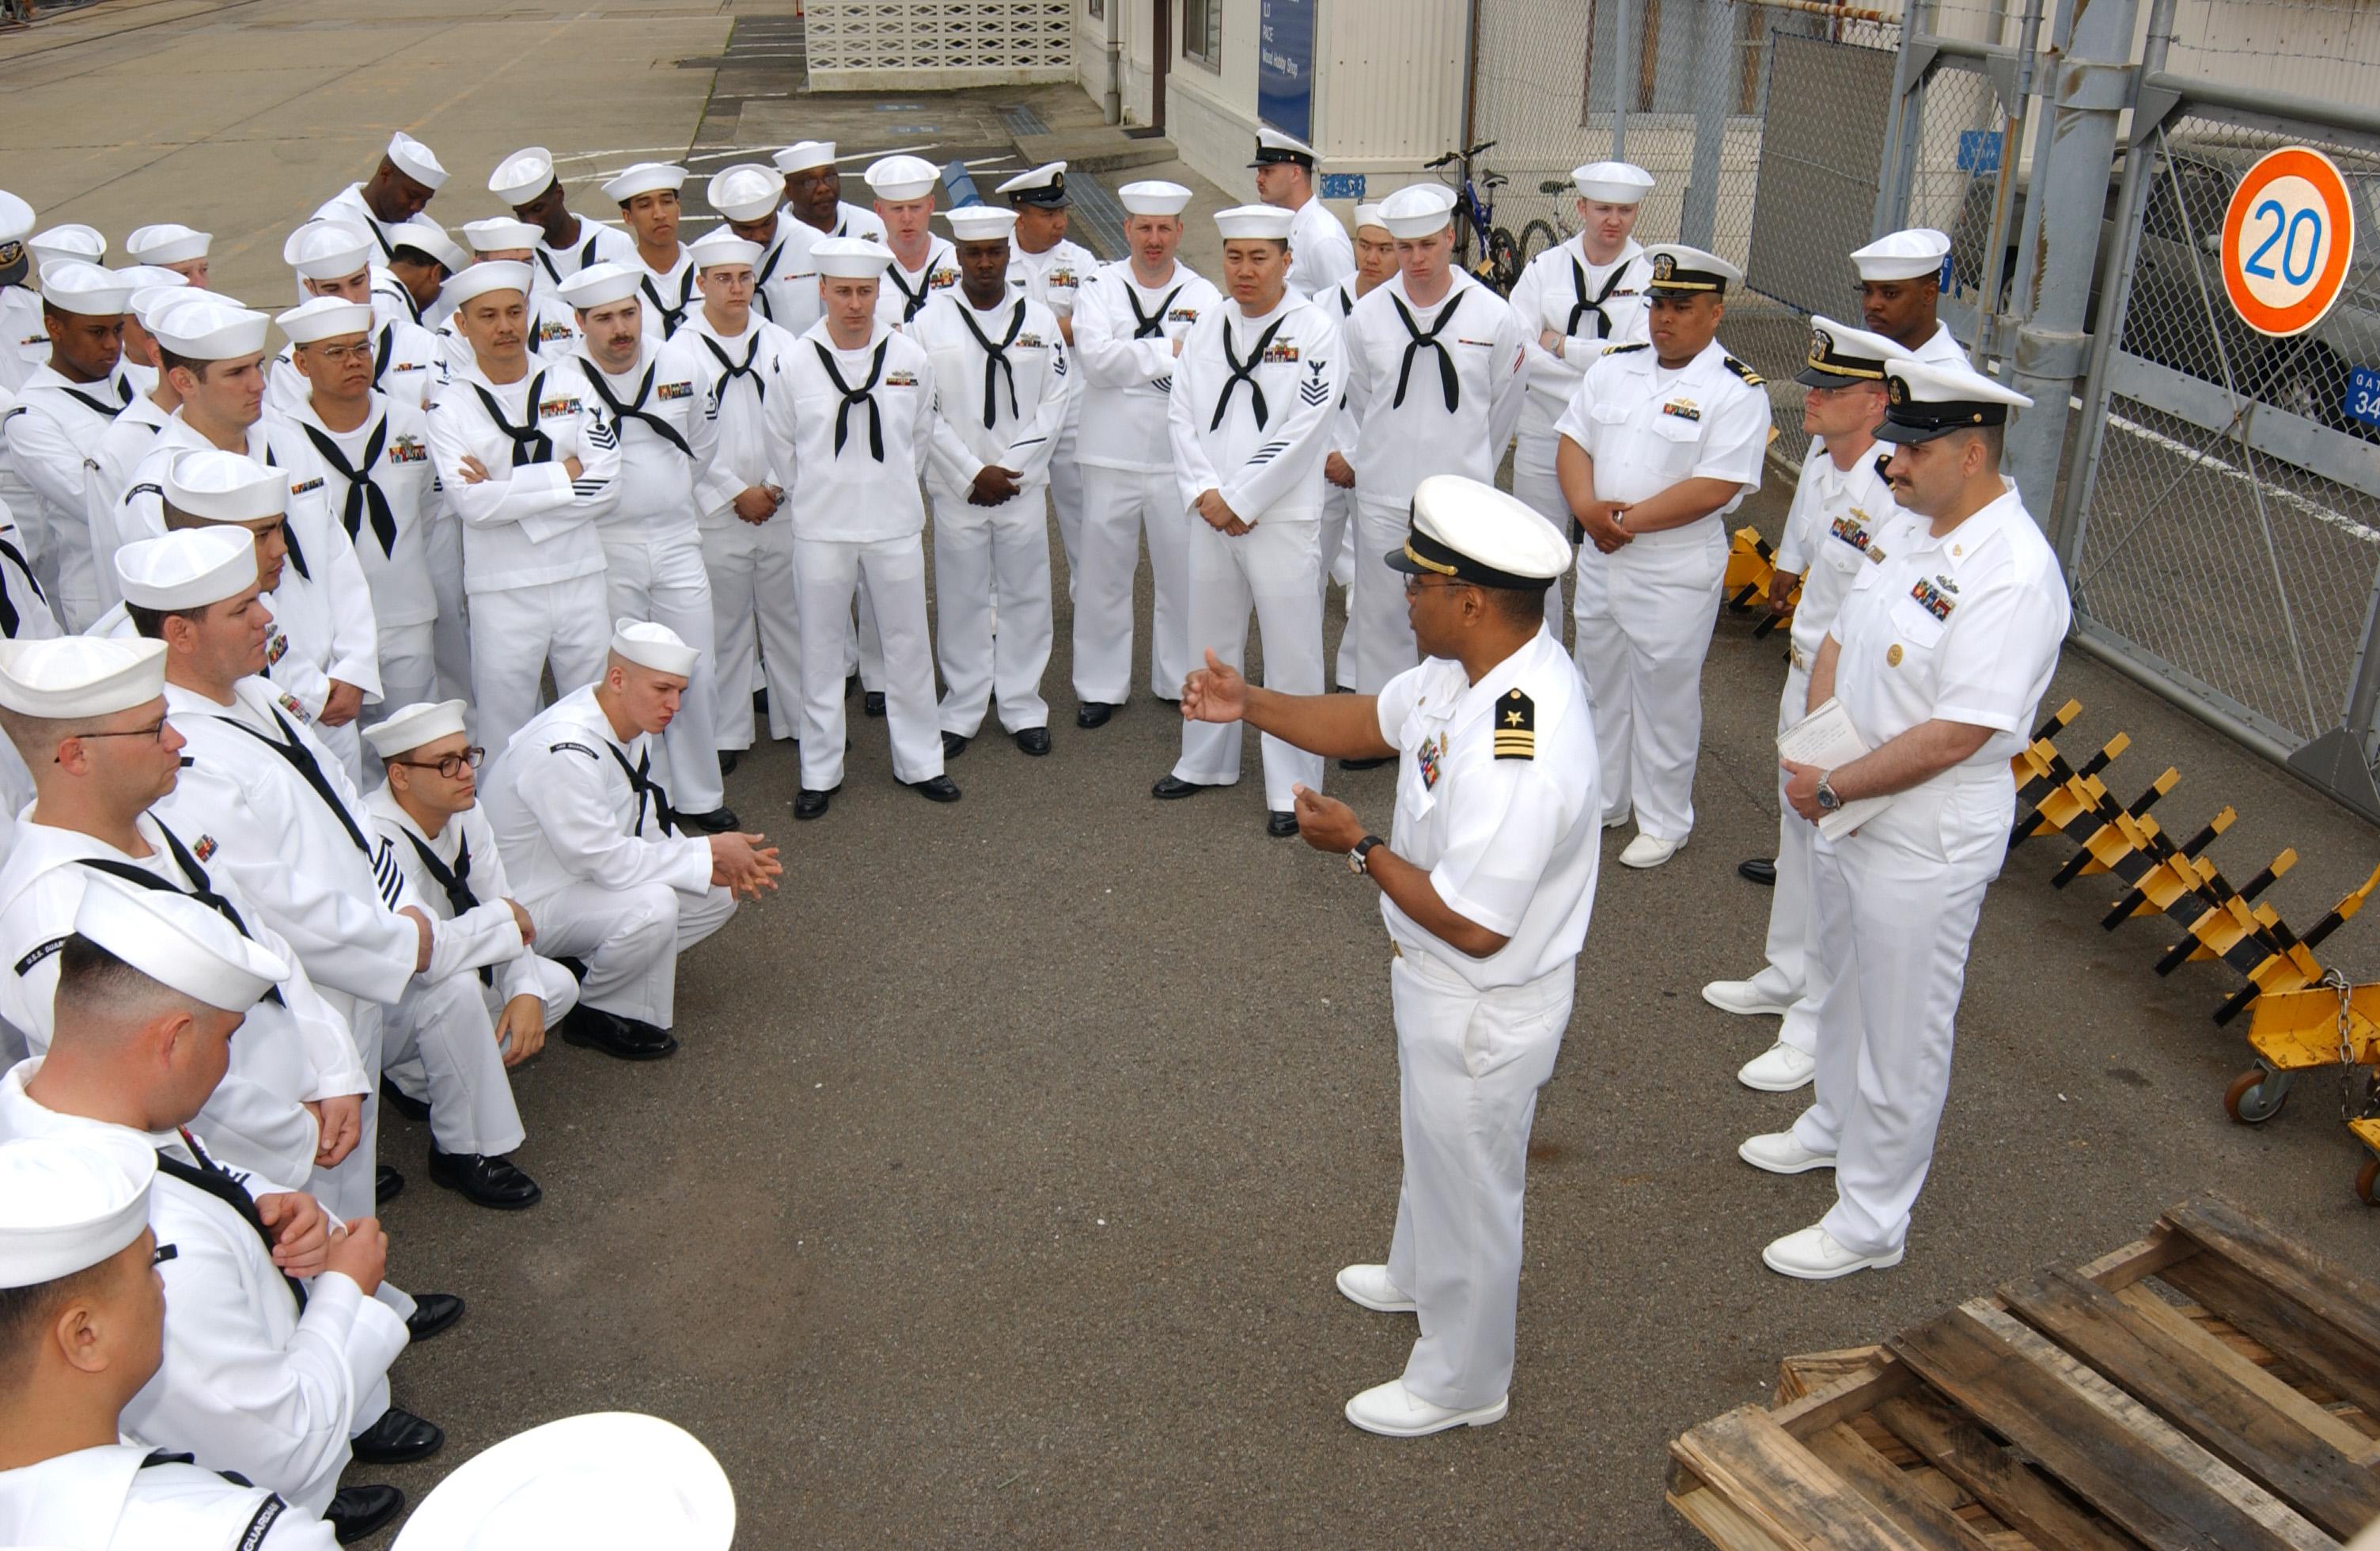 Navys new dress white uniforms put on display at Recruit